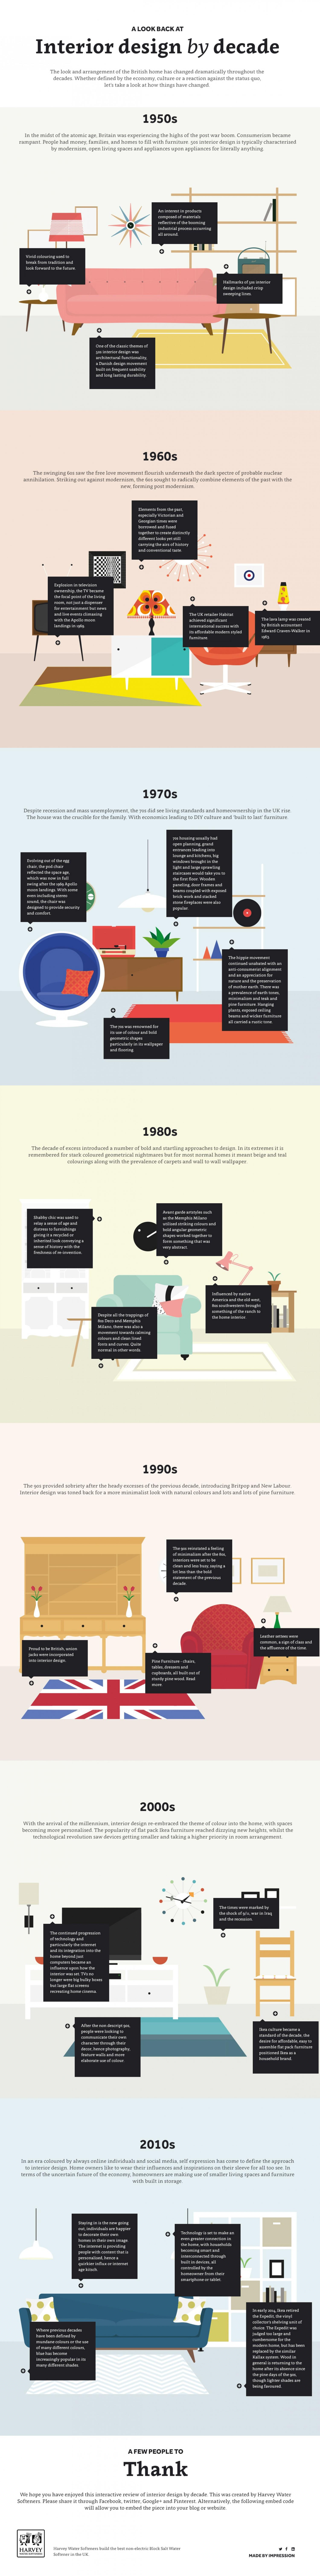 Interior Design By Decade Infographic History Of DesignRetro